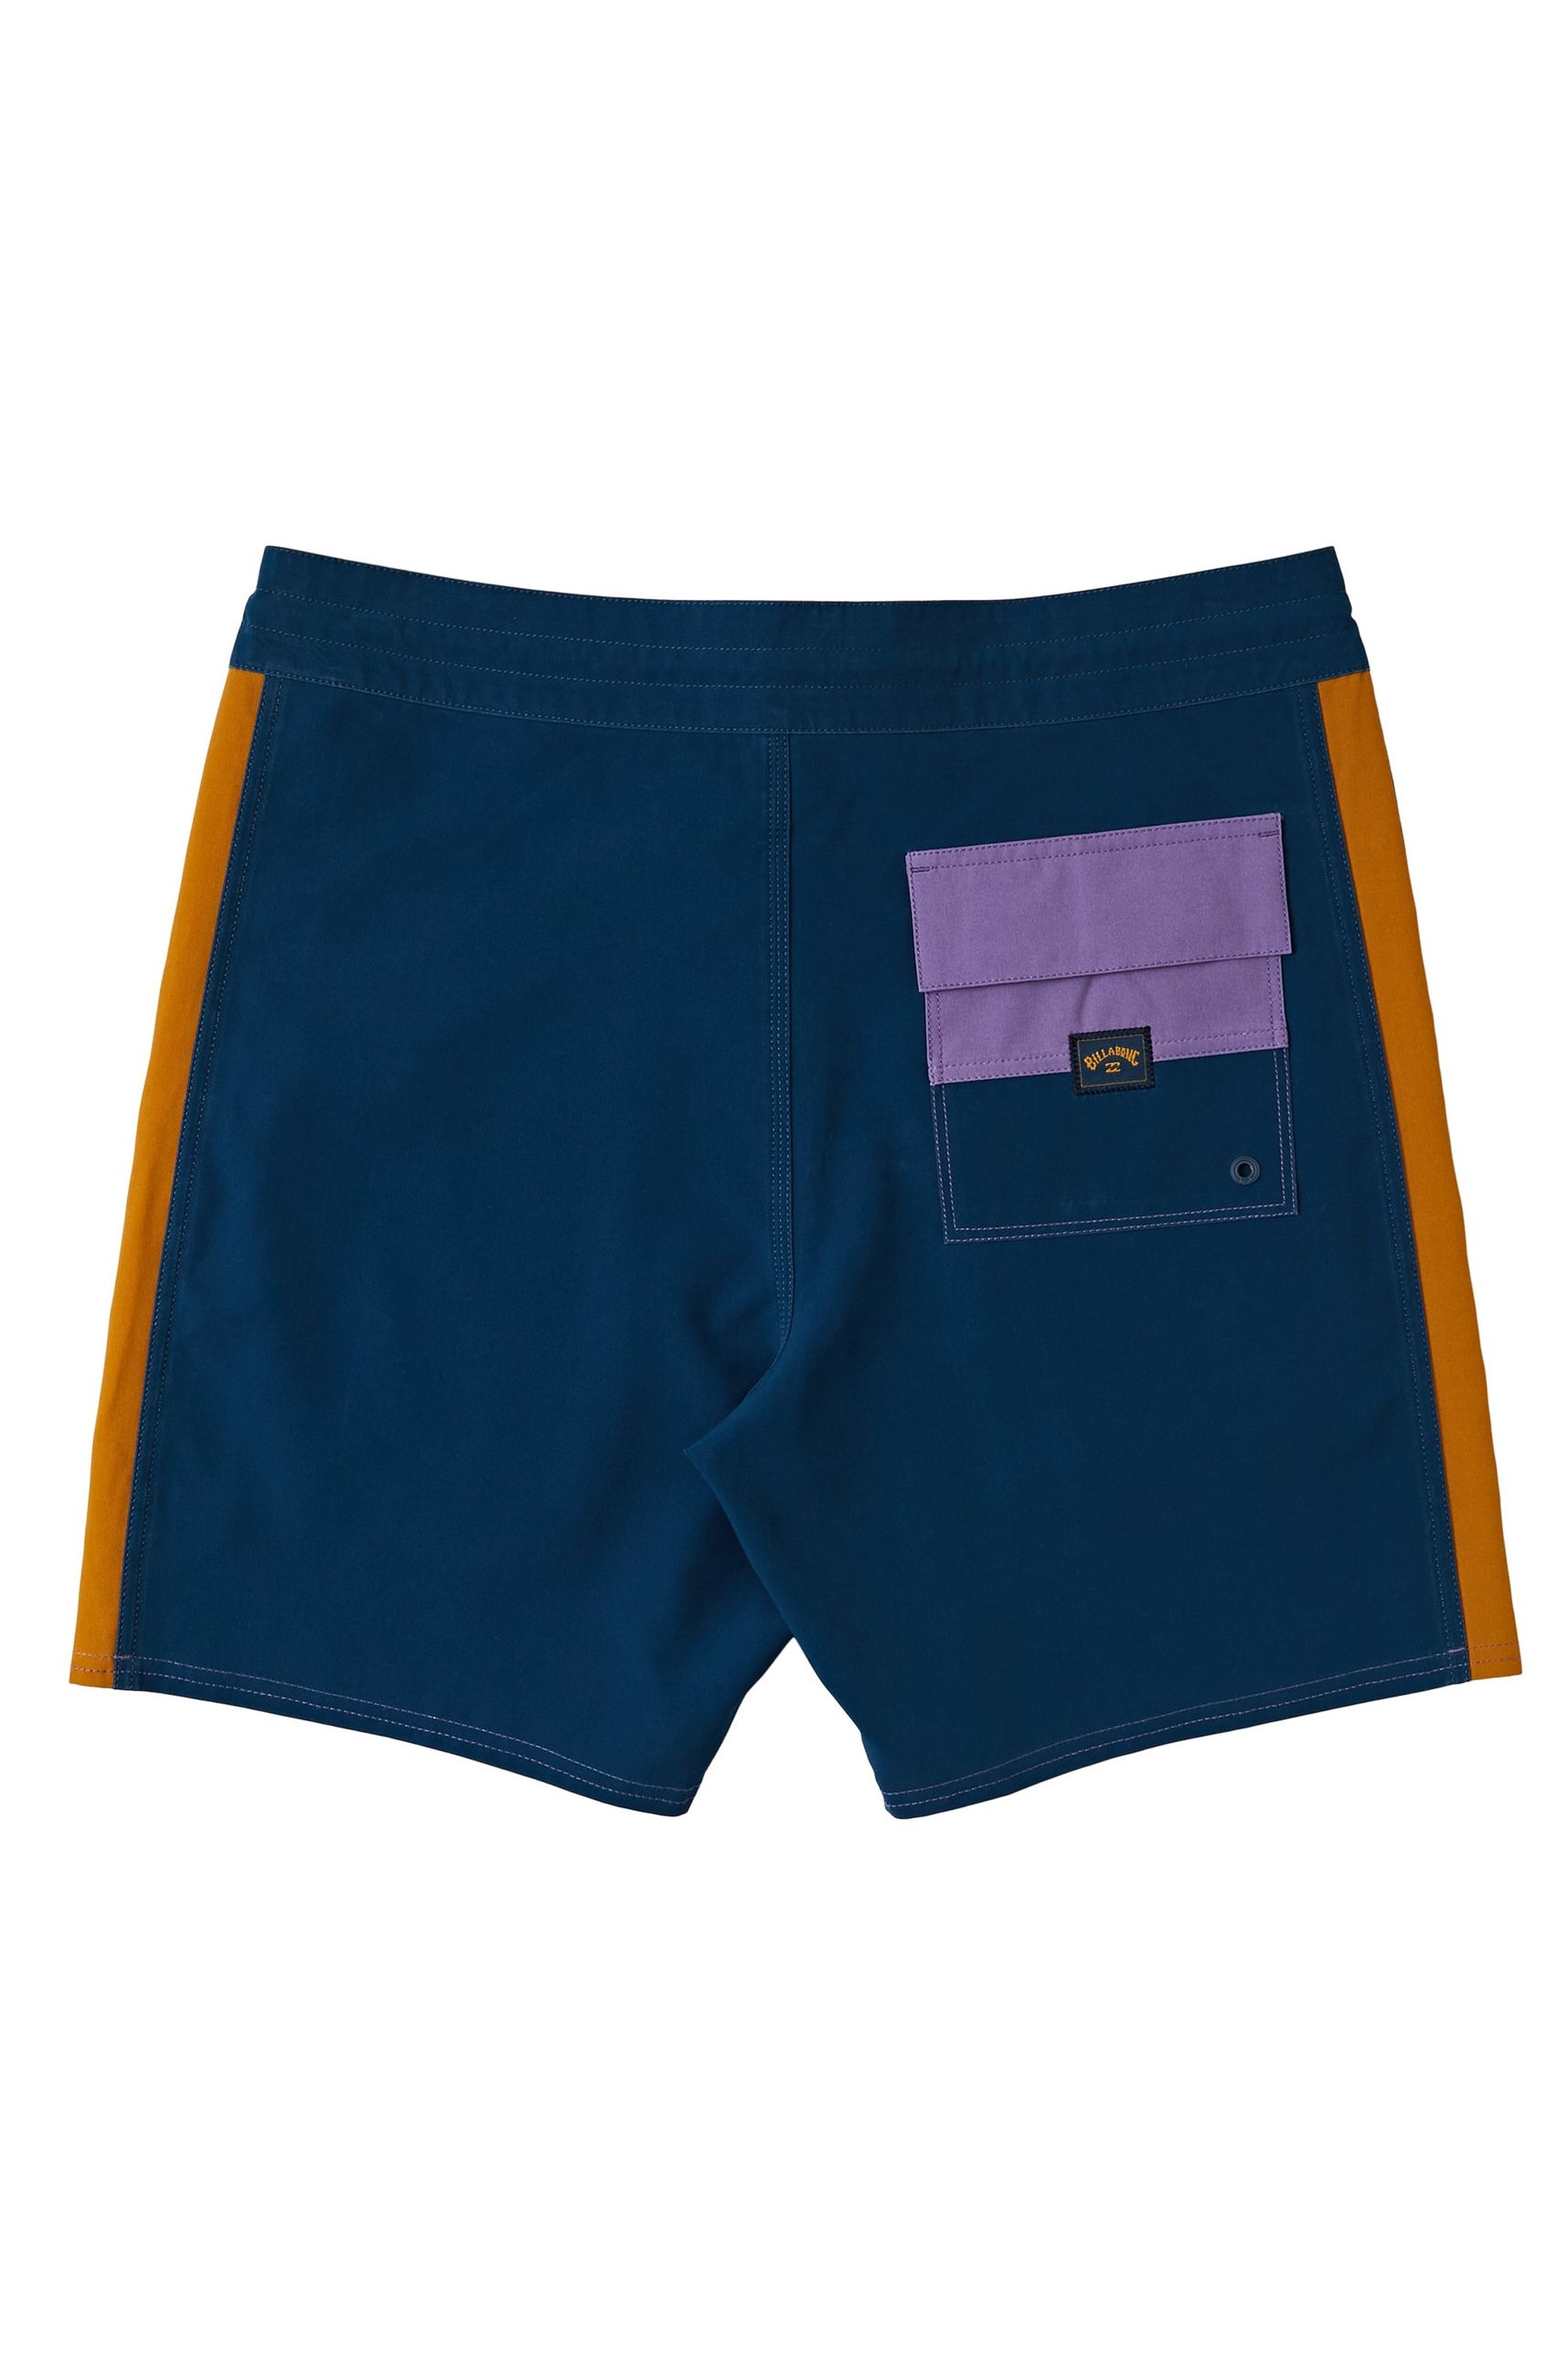 Billabong Boardshorts DBAH LT Lilac